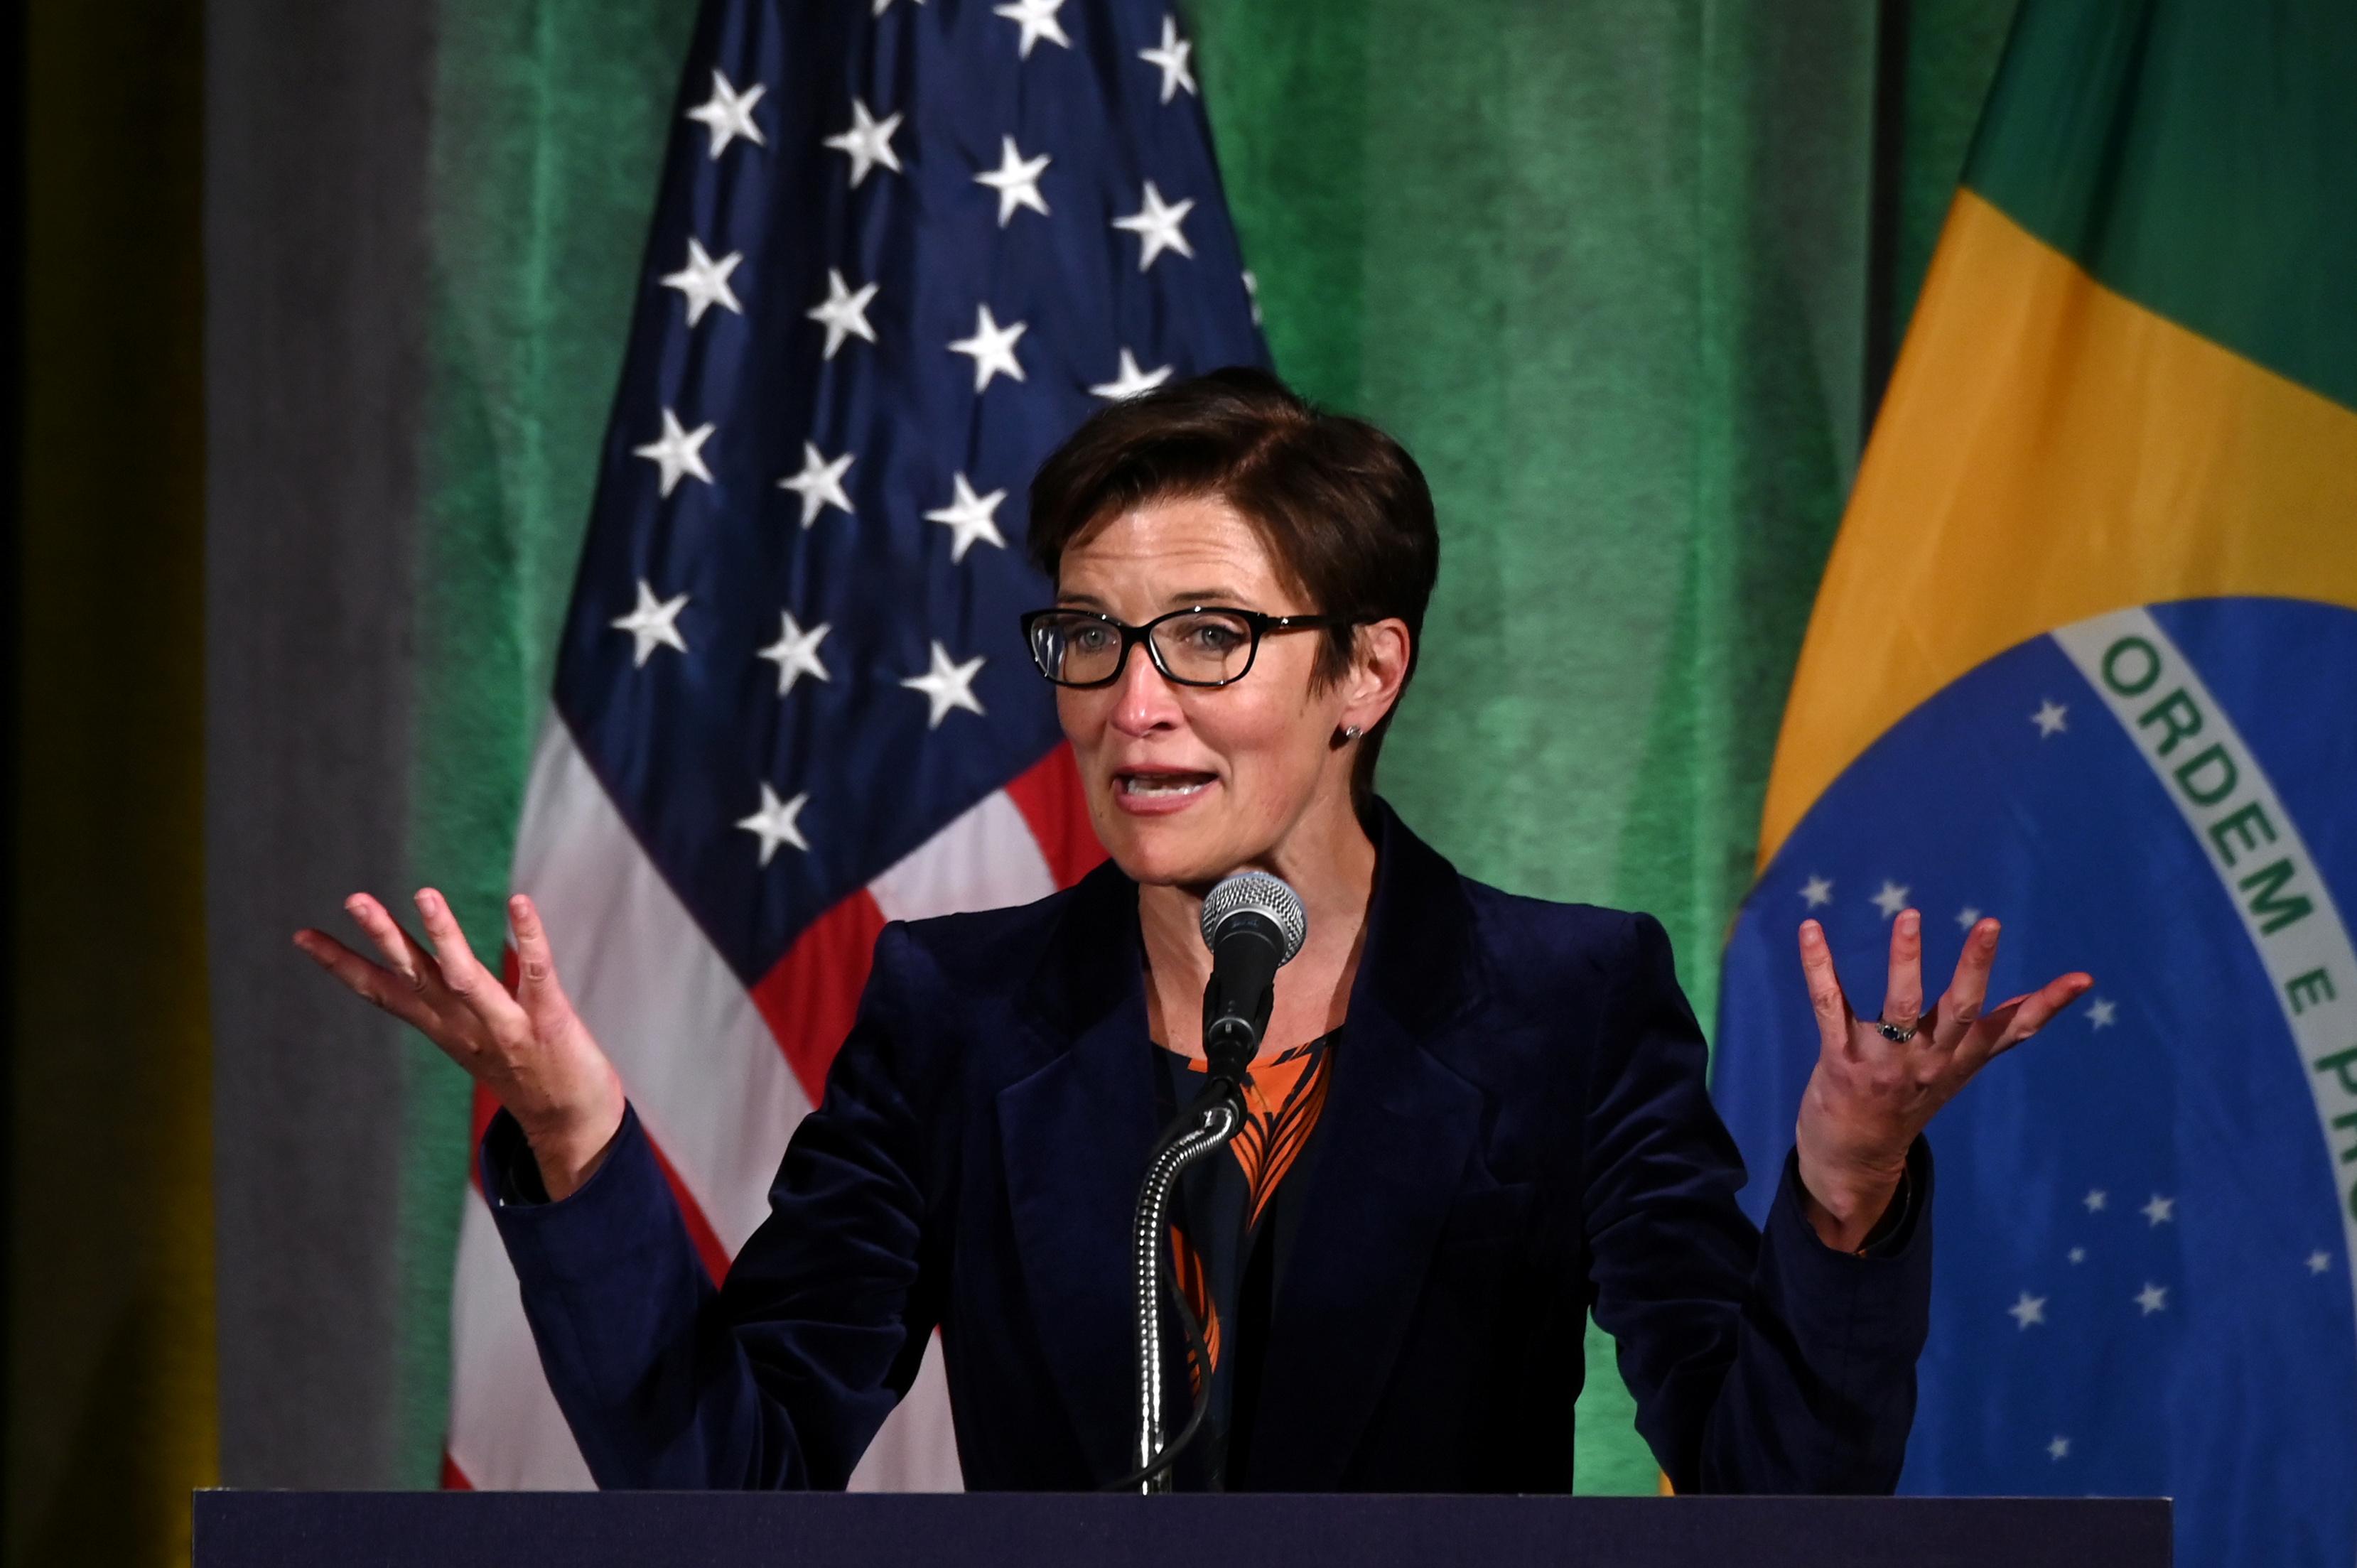 Citigroup Latin America CEO Jane Fraser addresses a Brazil-U.S. Business Council forum in Washington, U.S. March 18, 2019. REUTERS/Erin Scott